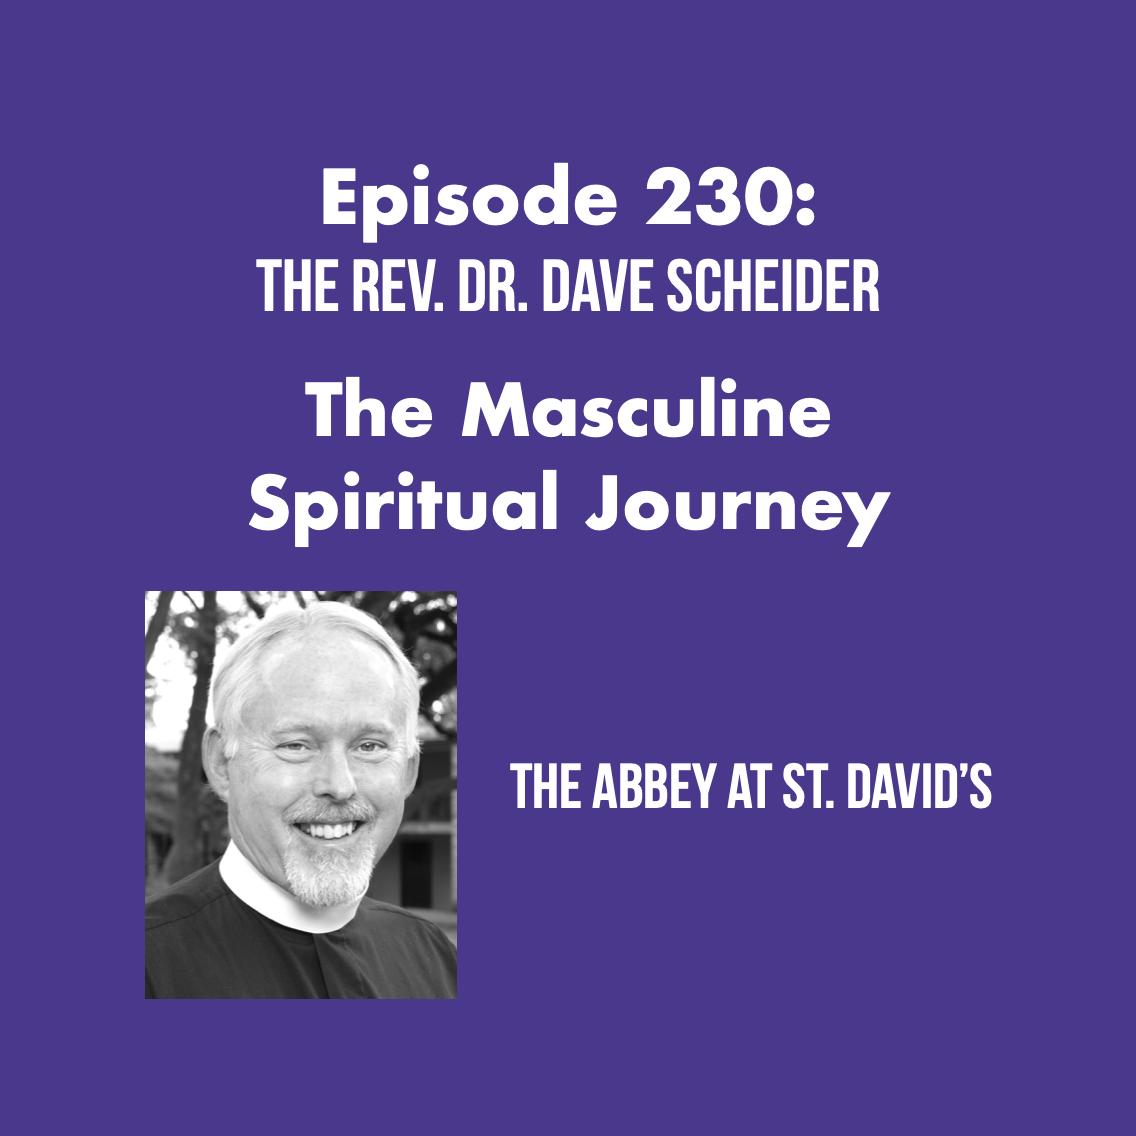 Episode 230: The Masculine Spiritual Journey with The Rev. Dr. Dave Scheider